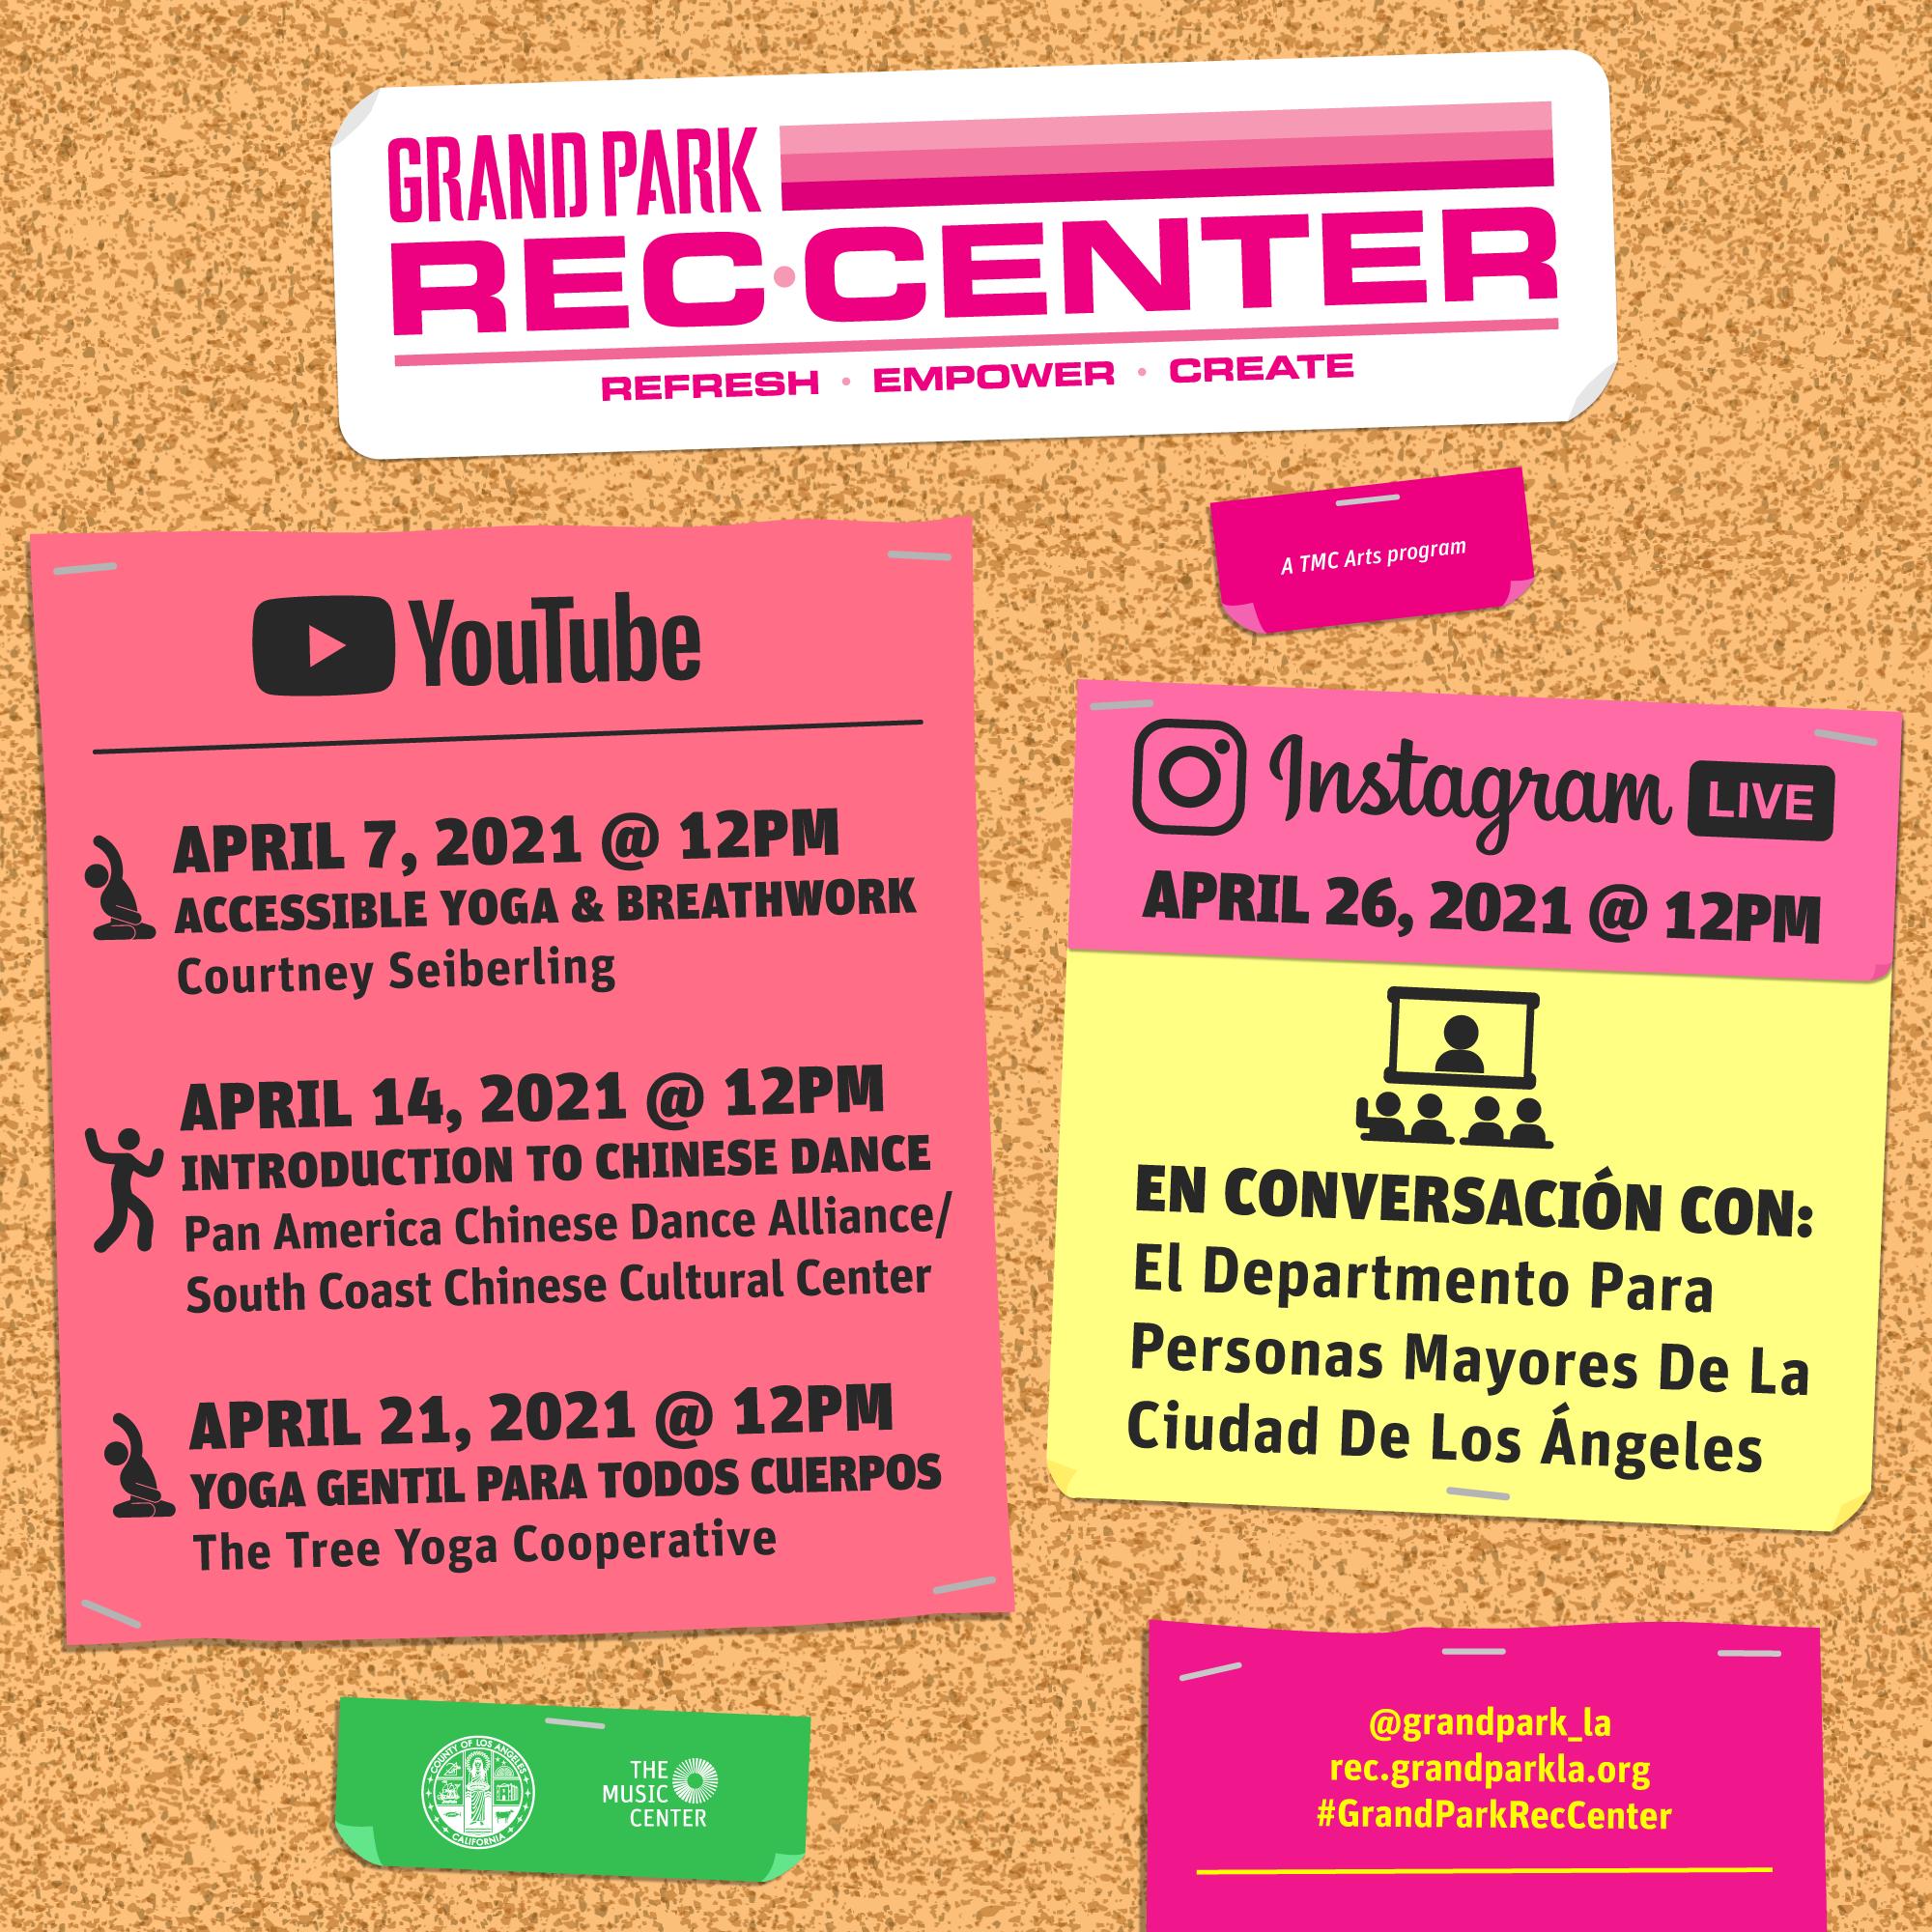 Grand Park REC Center April Lineup